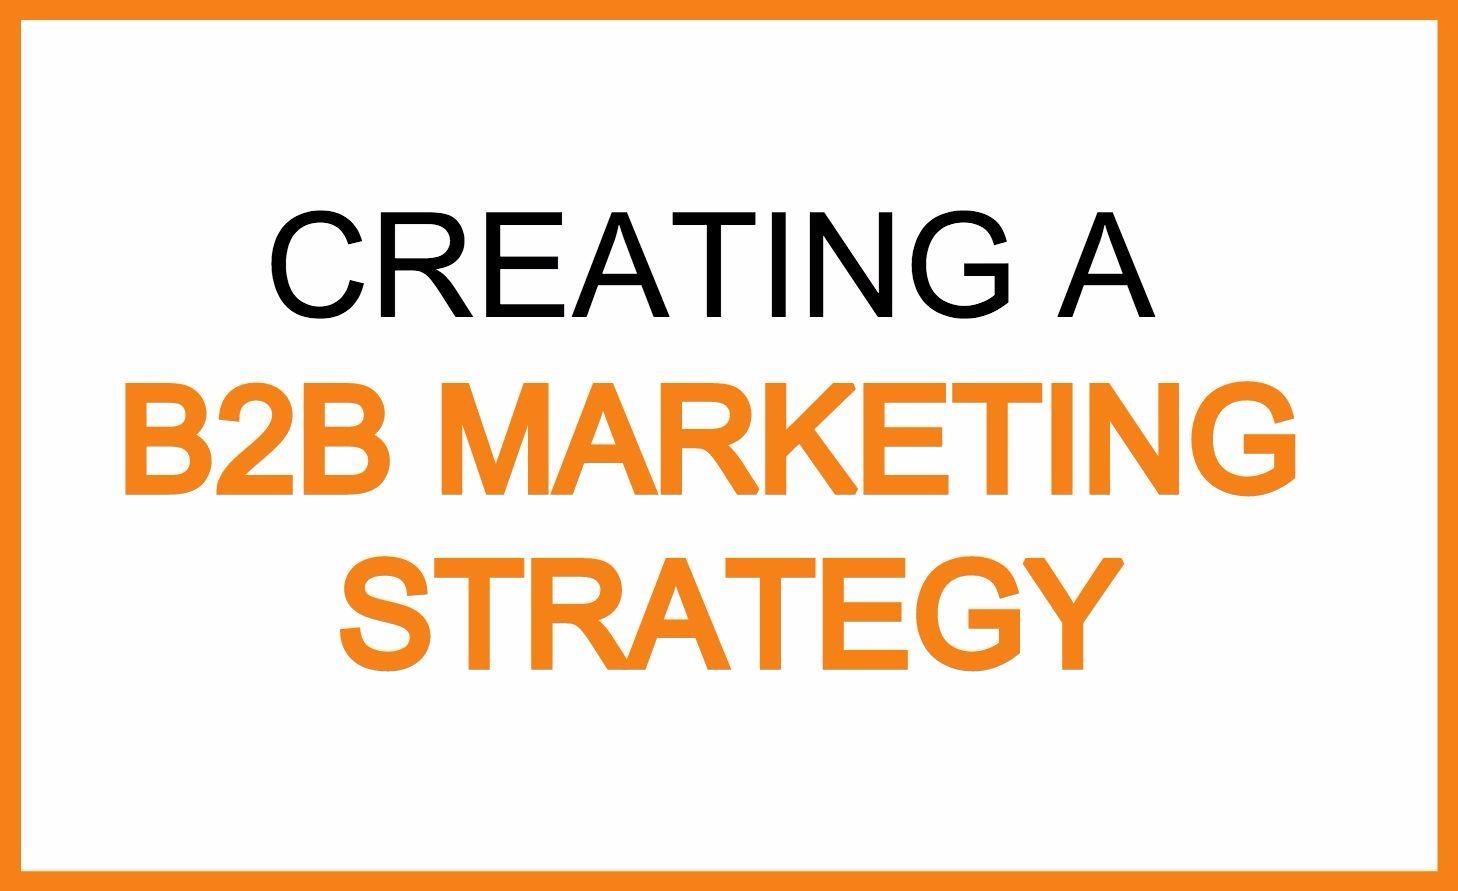 B2B marketing strategy.jpg